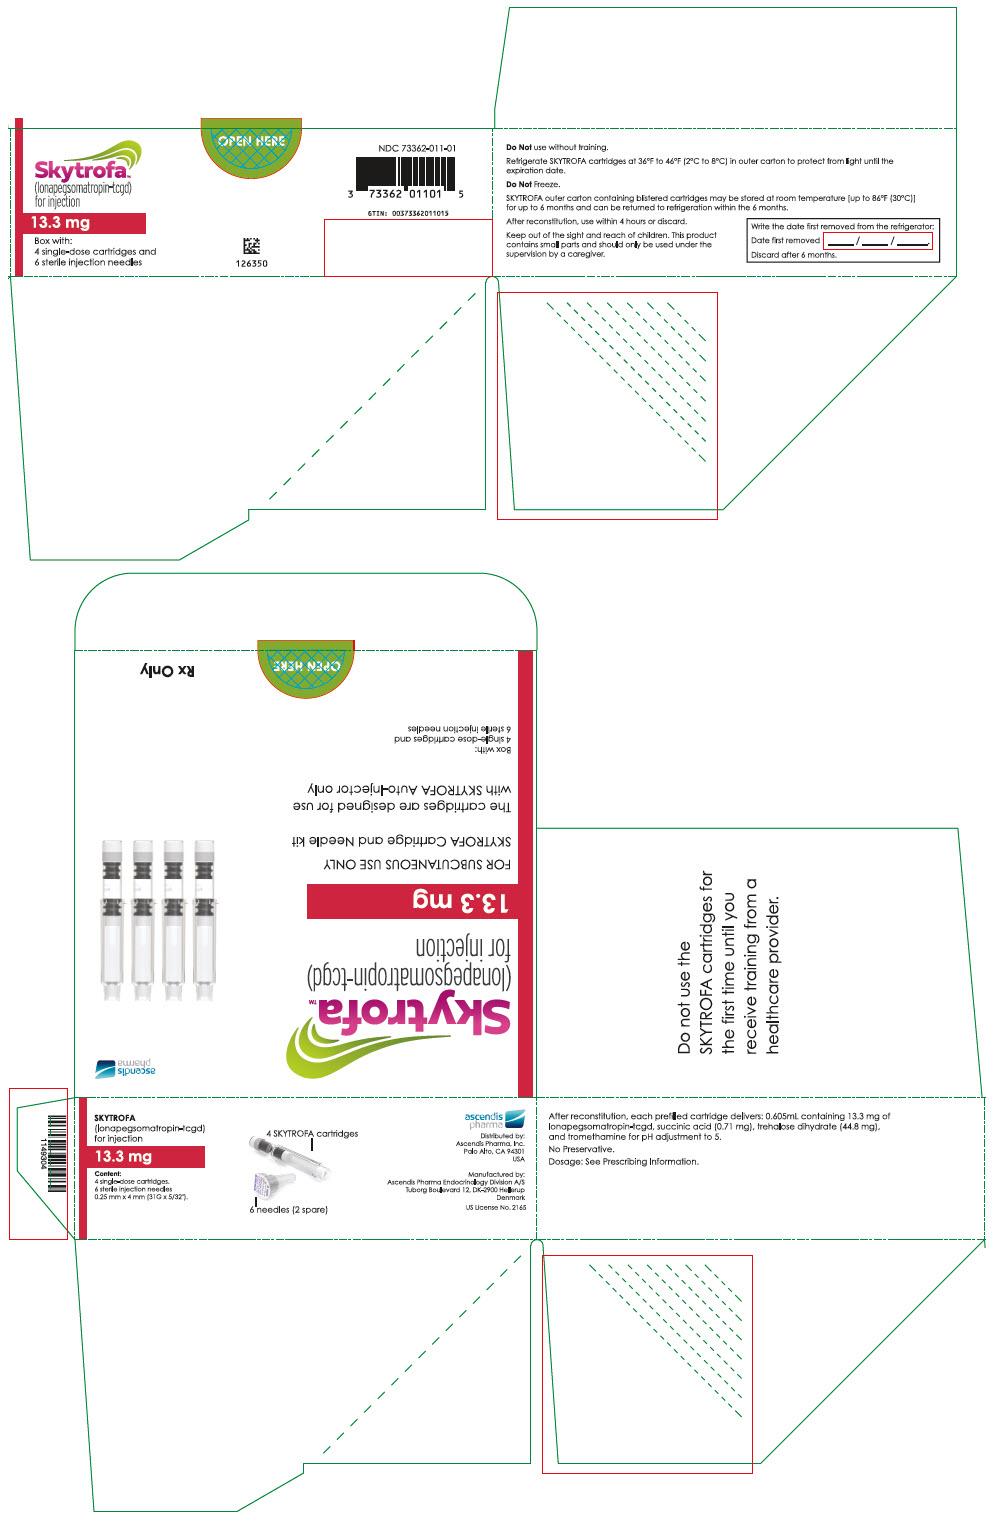 PRINCIPAL DISPLAY PANEL - 13.3 mg Cartridge Blister Pack Carton